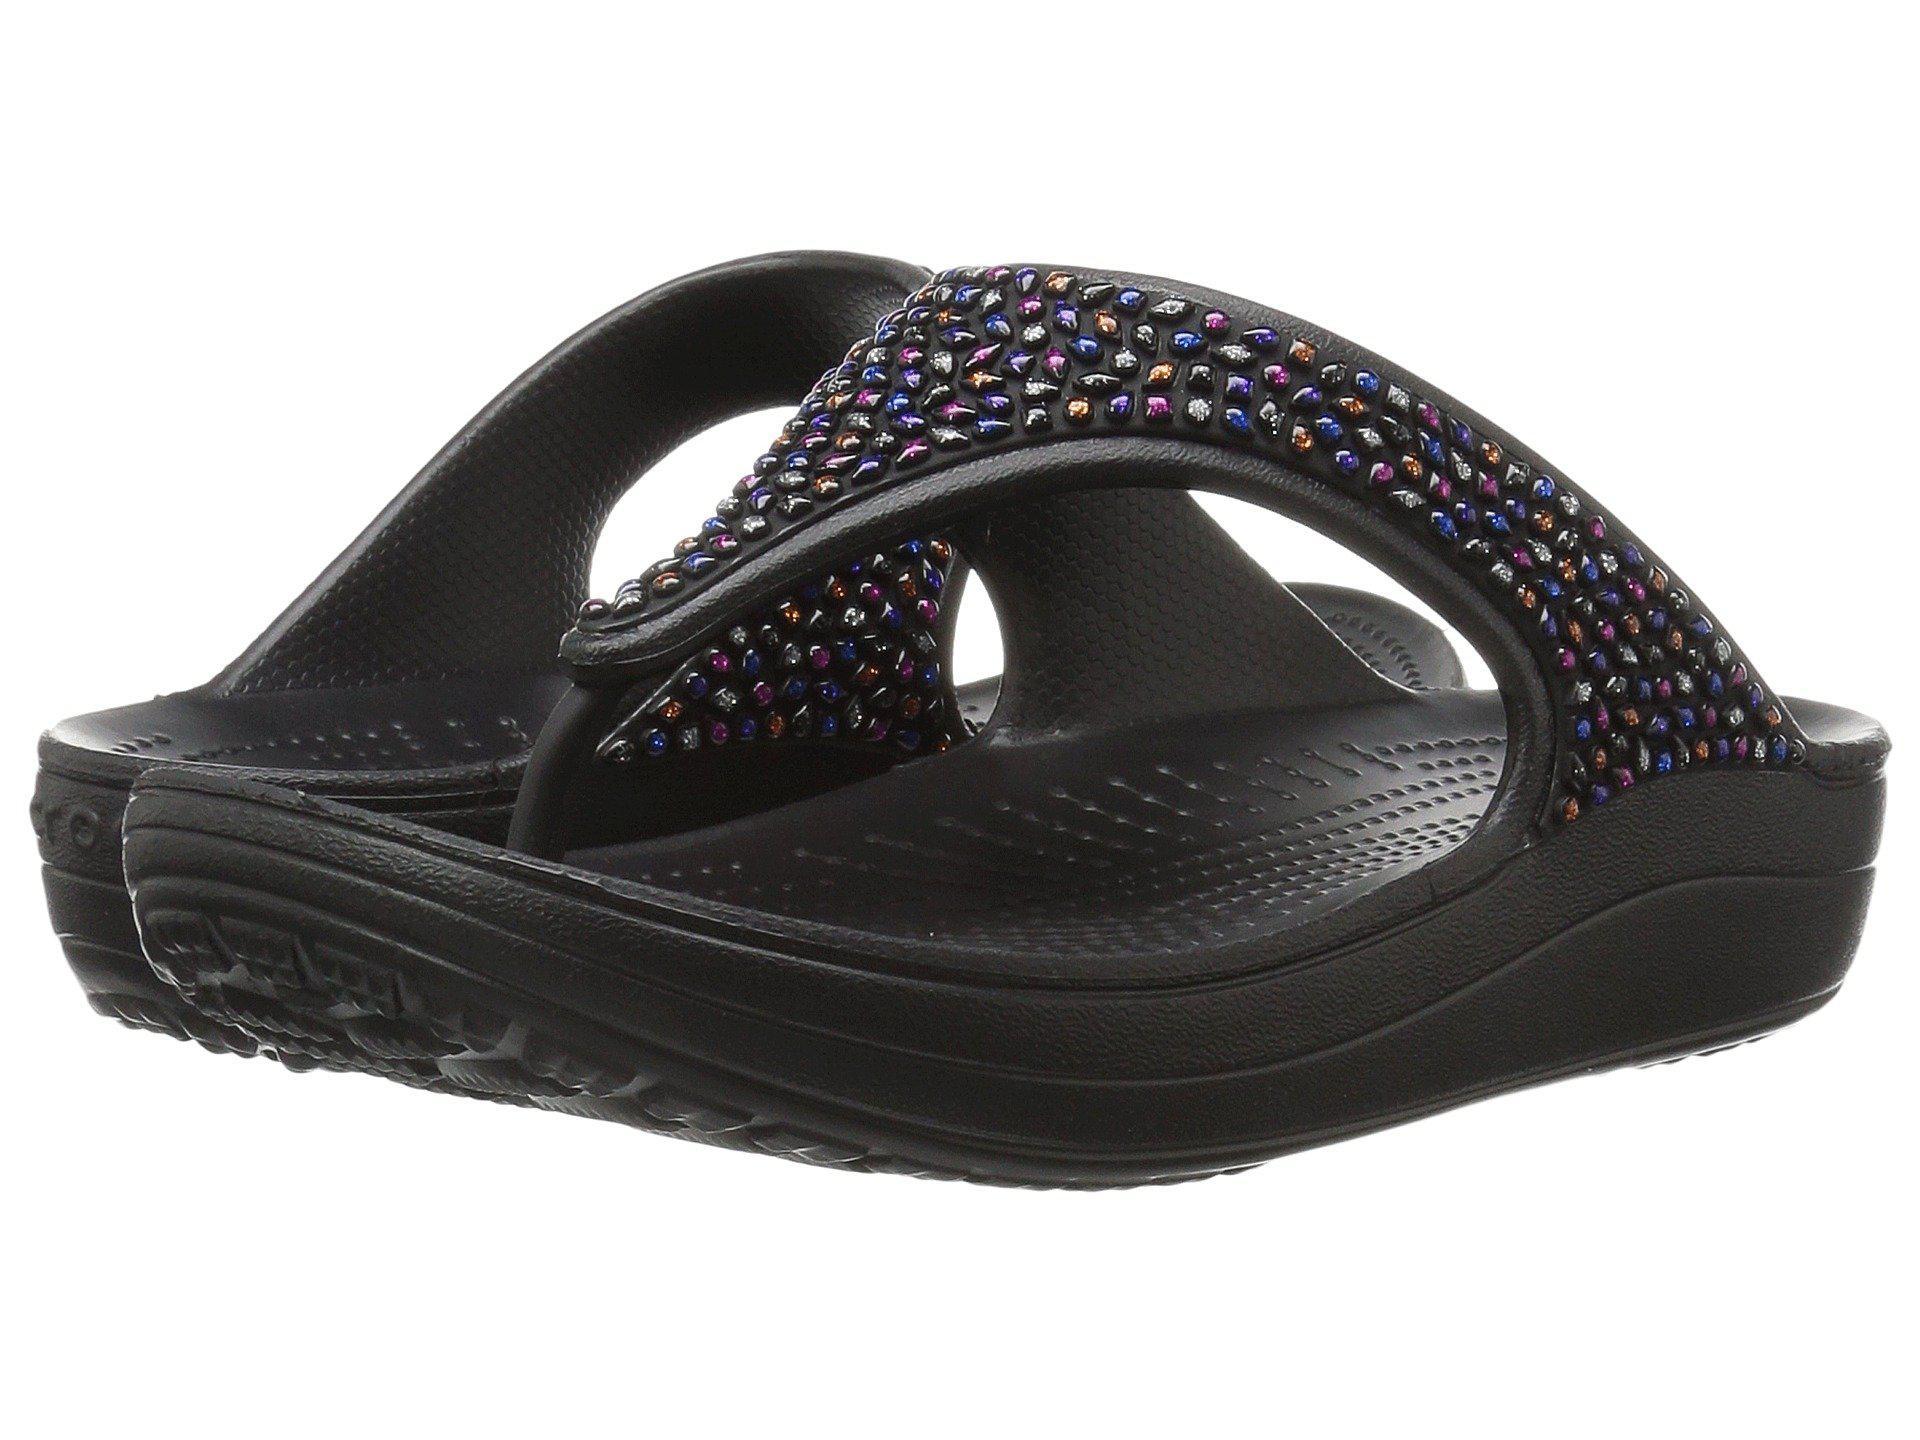 8f2291b3b3e6 Lyst - Crocs™ Sloane Embellished Flip in Black